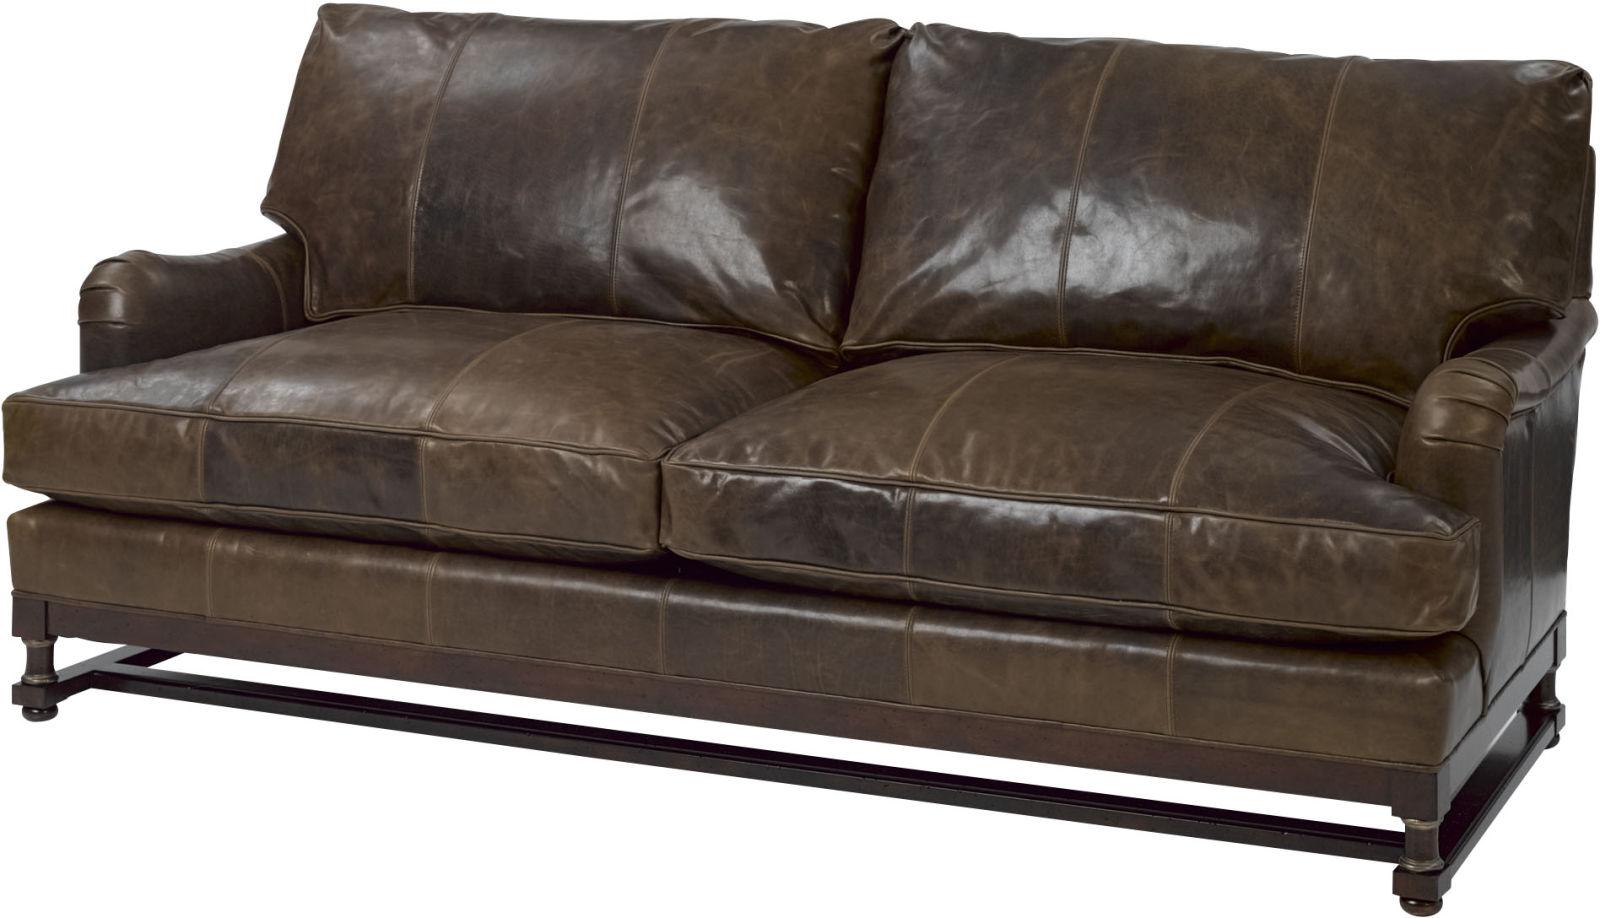 wesley hall sofas sofa big lots furniture hickory nc product page l8194